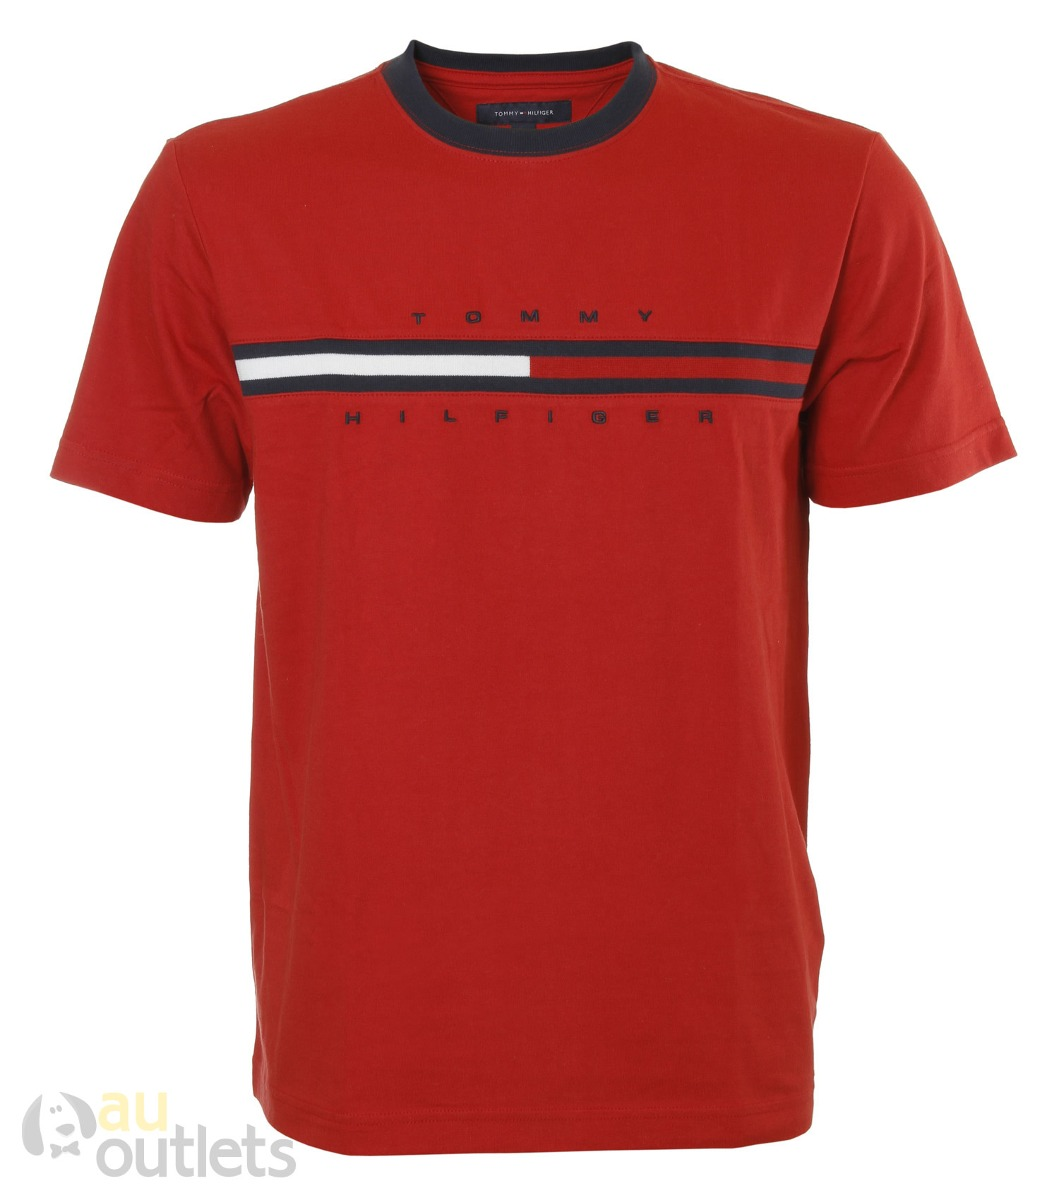 03f75867198839 Camiseta Masculina Tommy Hilfiger Monet - R$ 230,59 em Mercado Livre